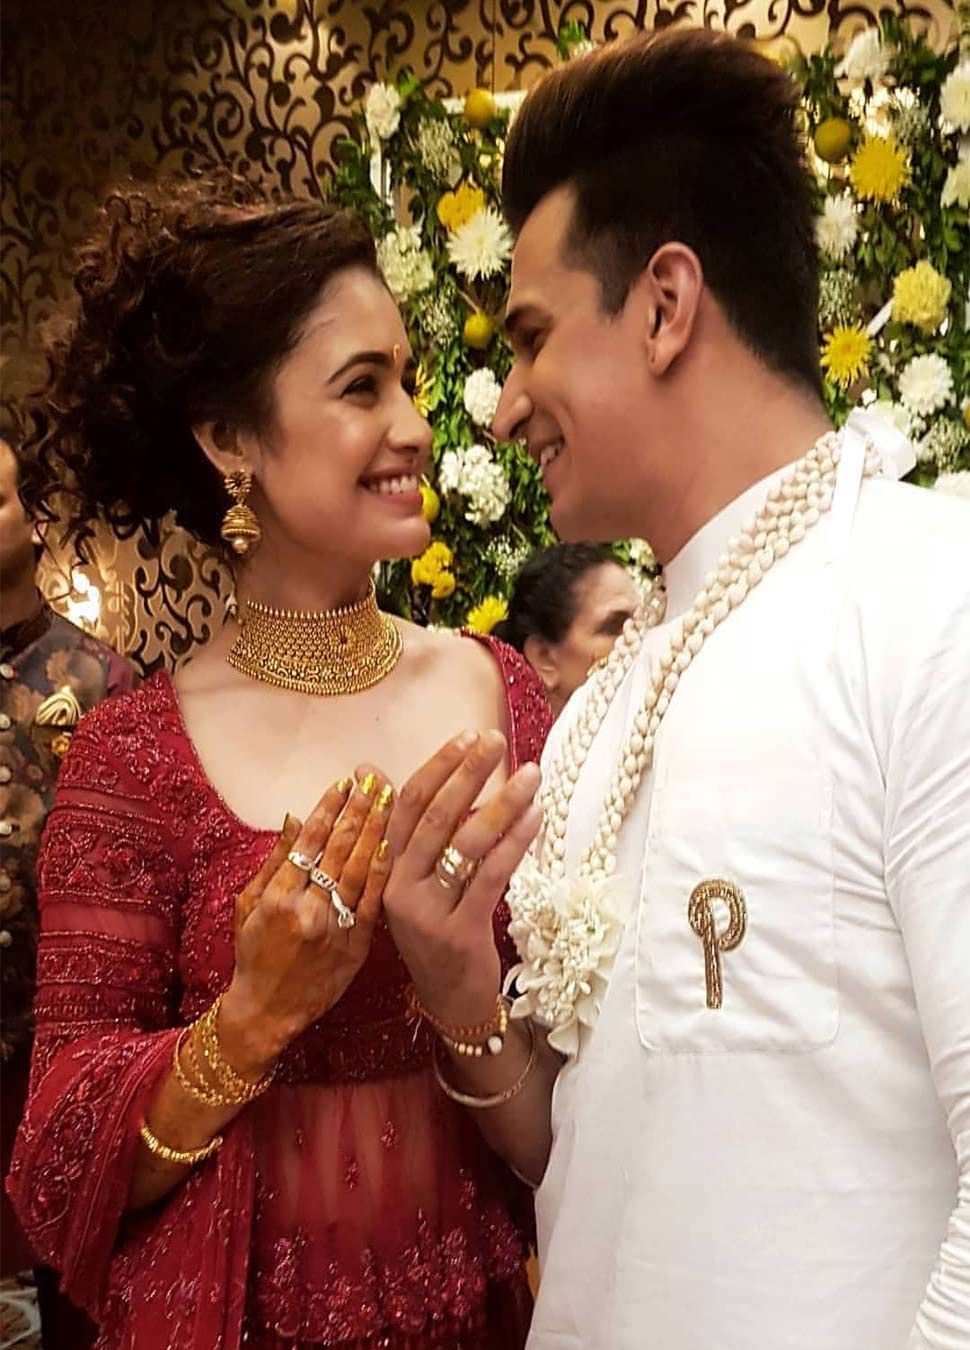 Engagement Ceremony of Princeand Yuvika